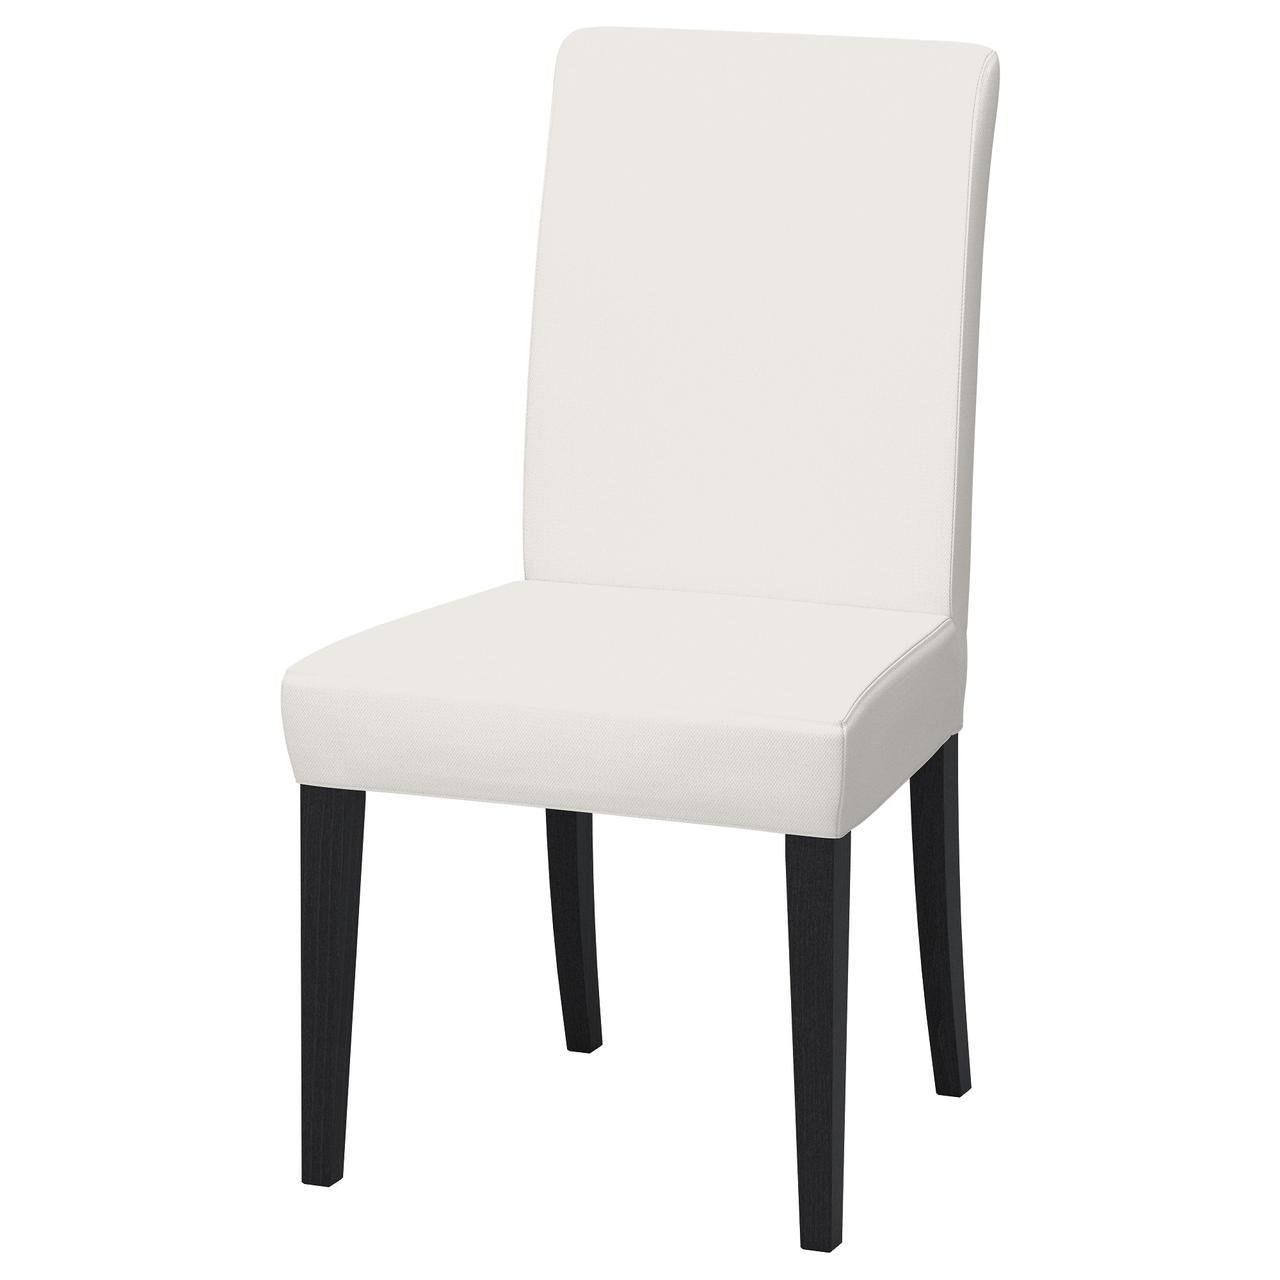 Кресло IKEA HENRIKSDAL Gräsbo белое 592.207.50